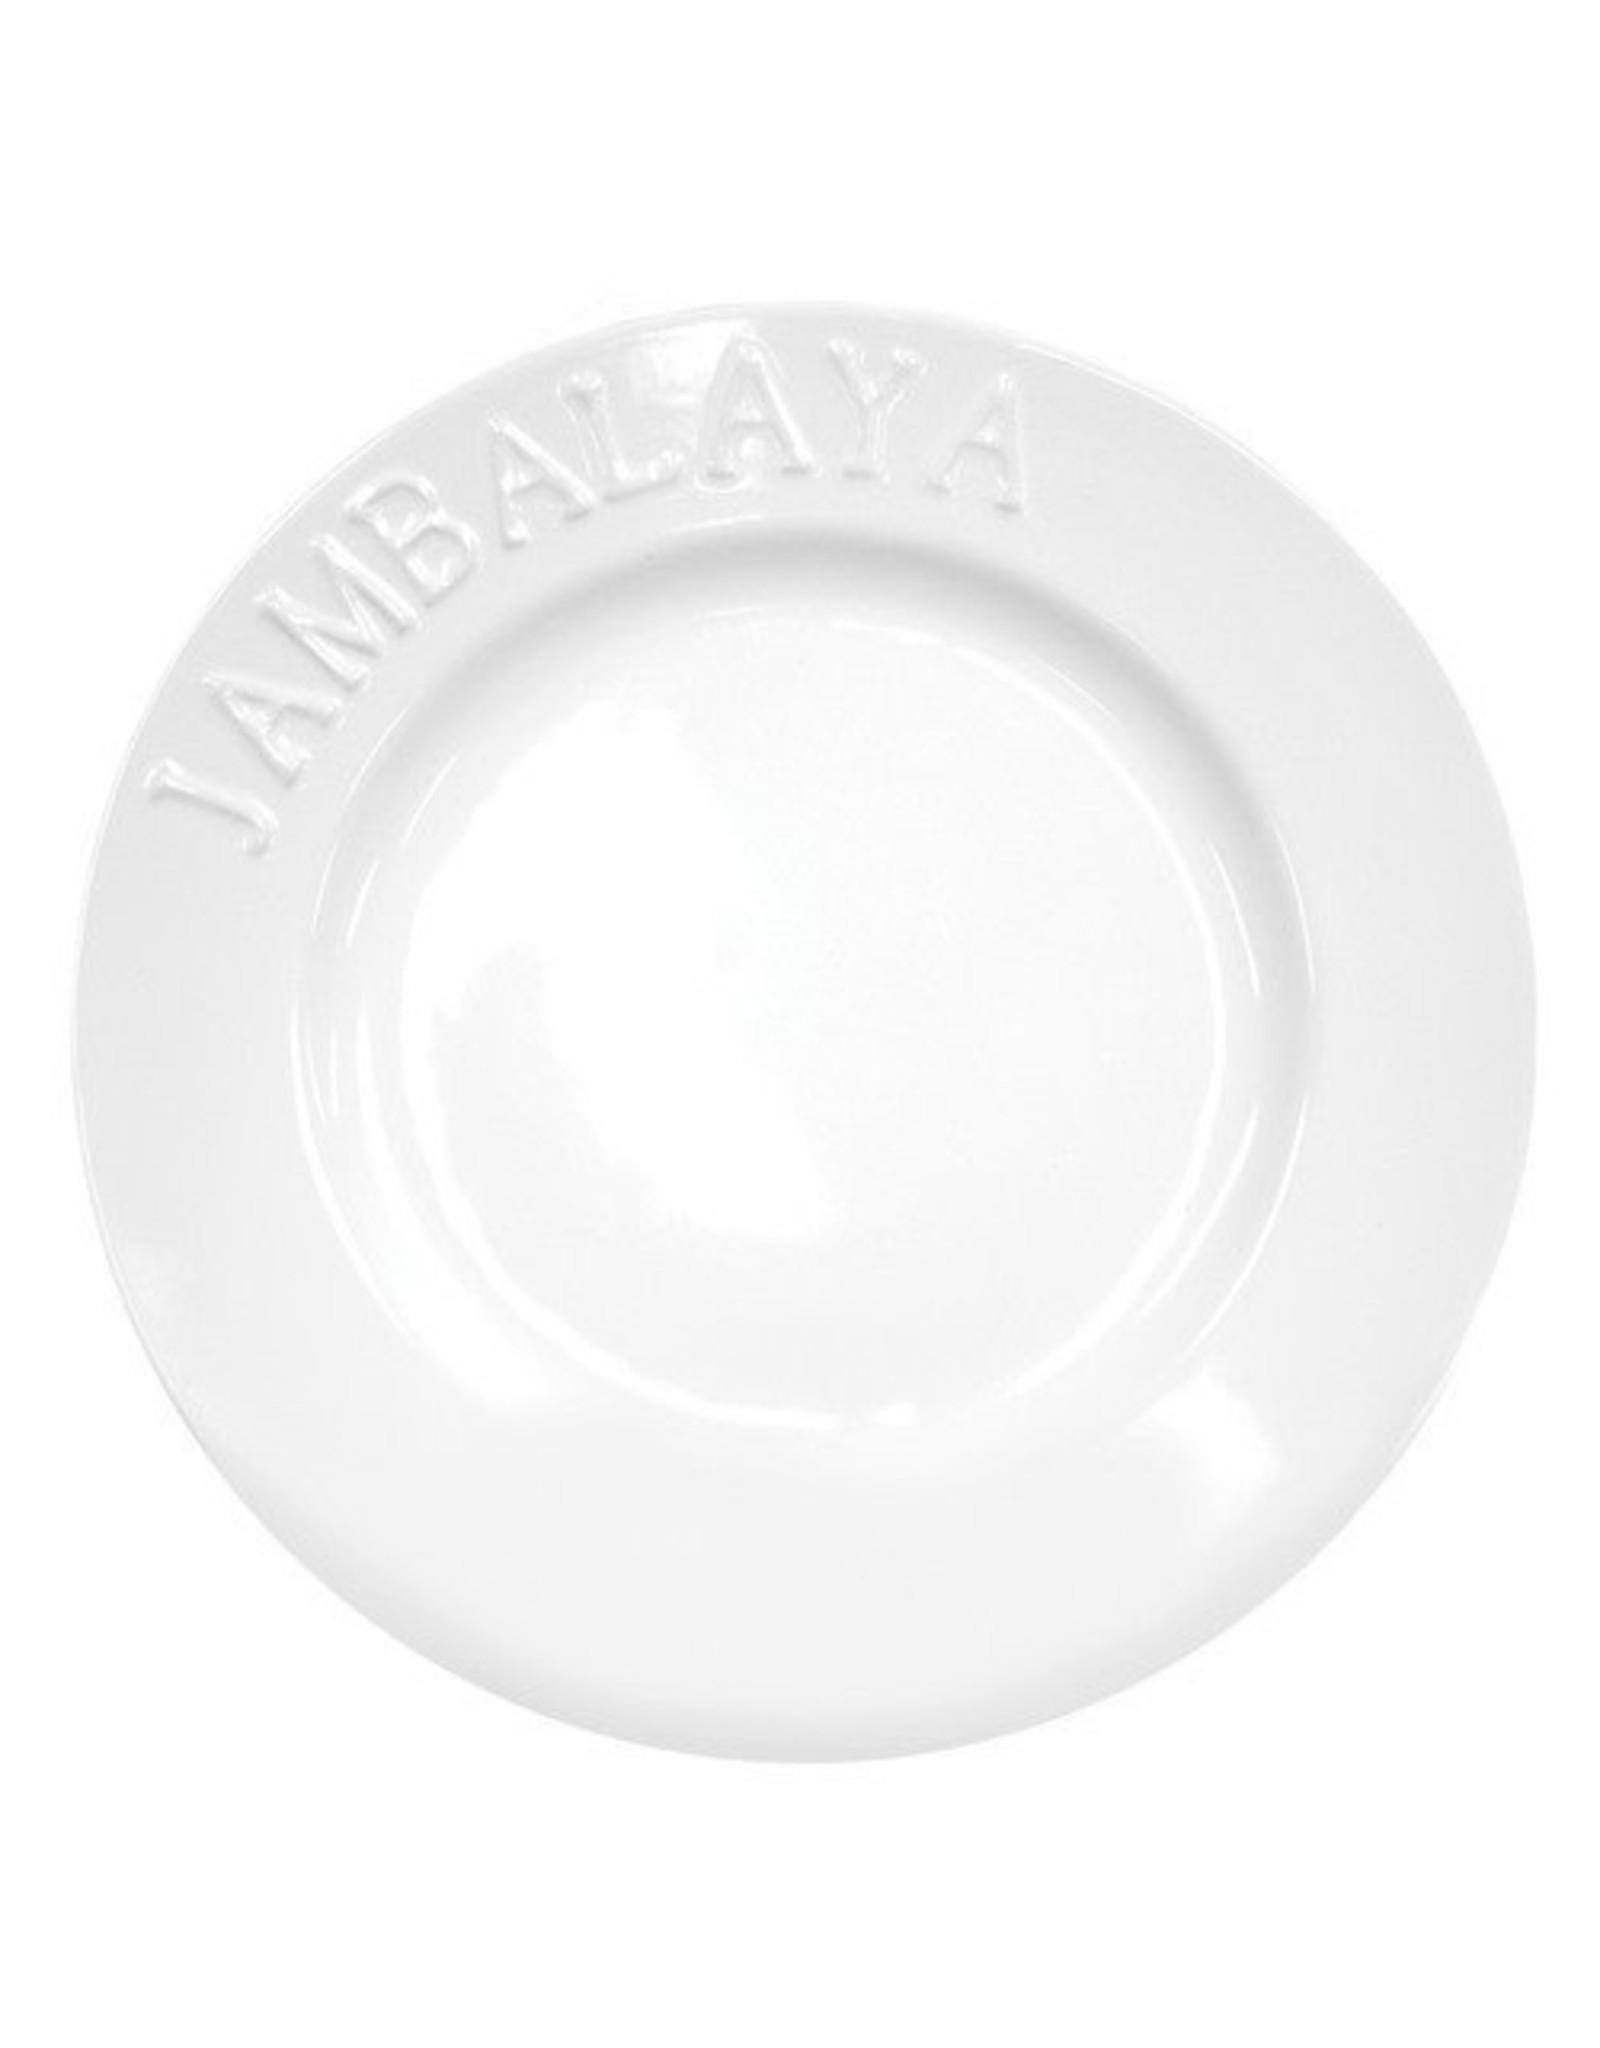 Roux Brand Jambalaya Plate